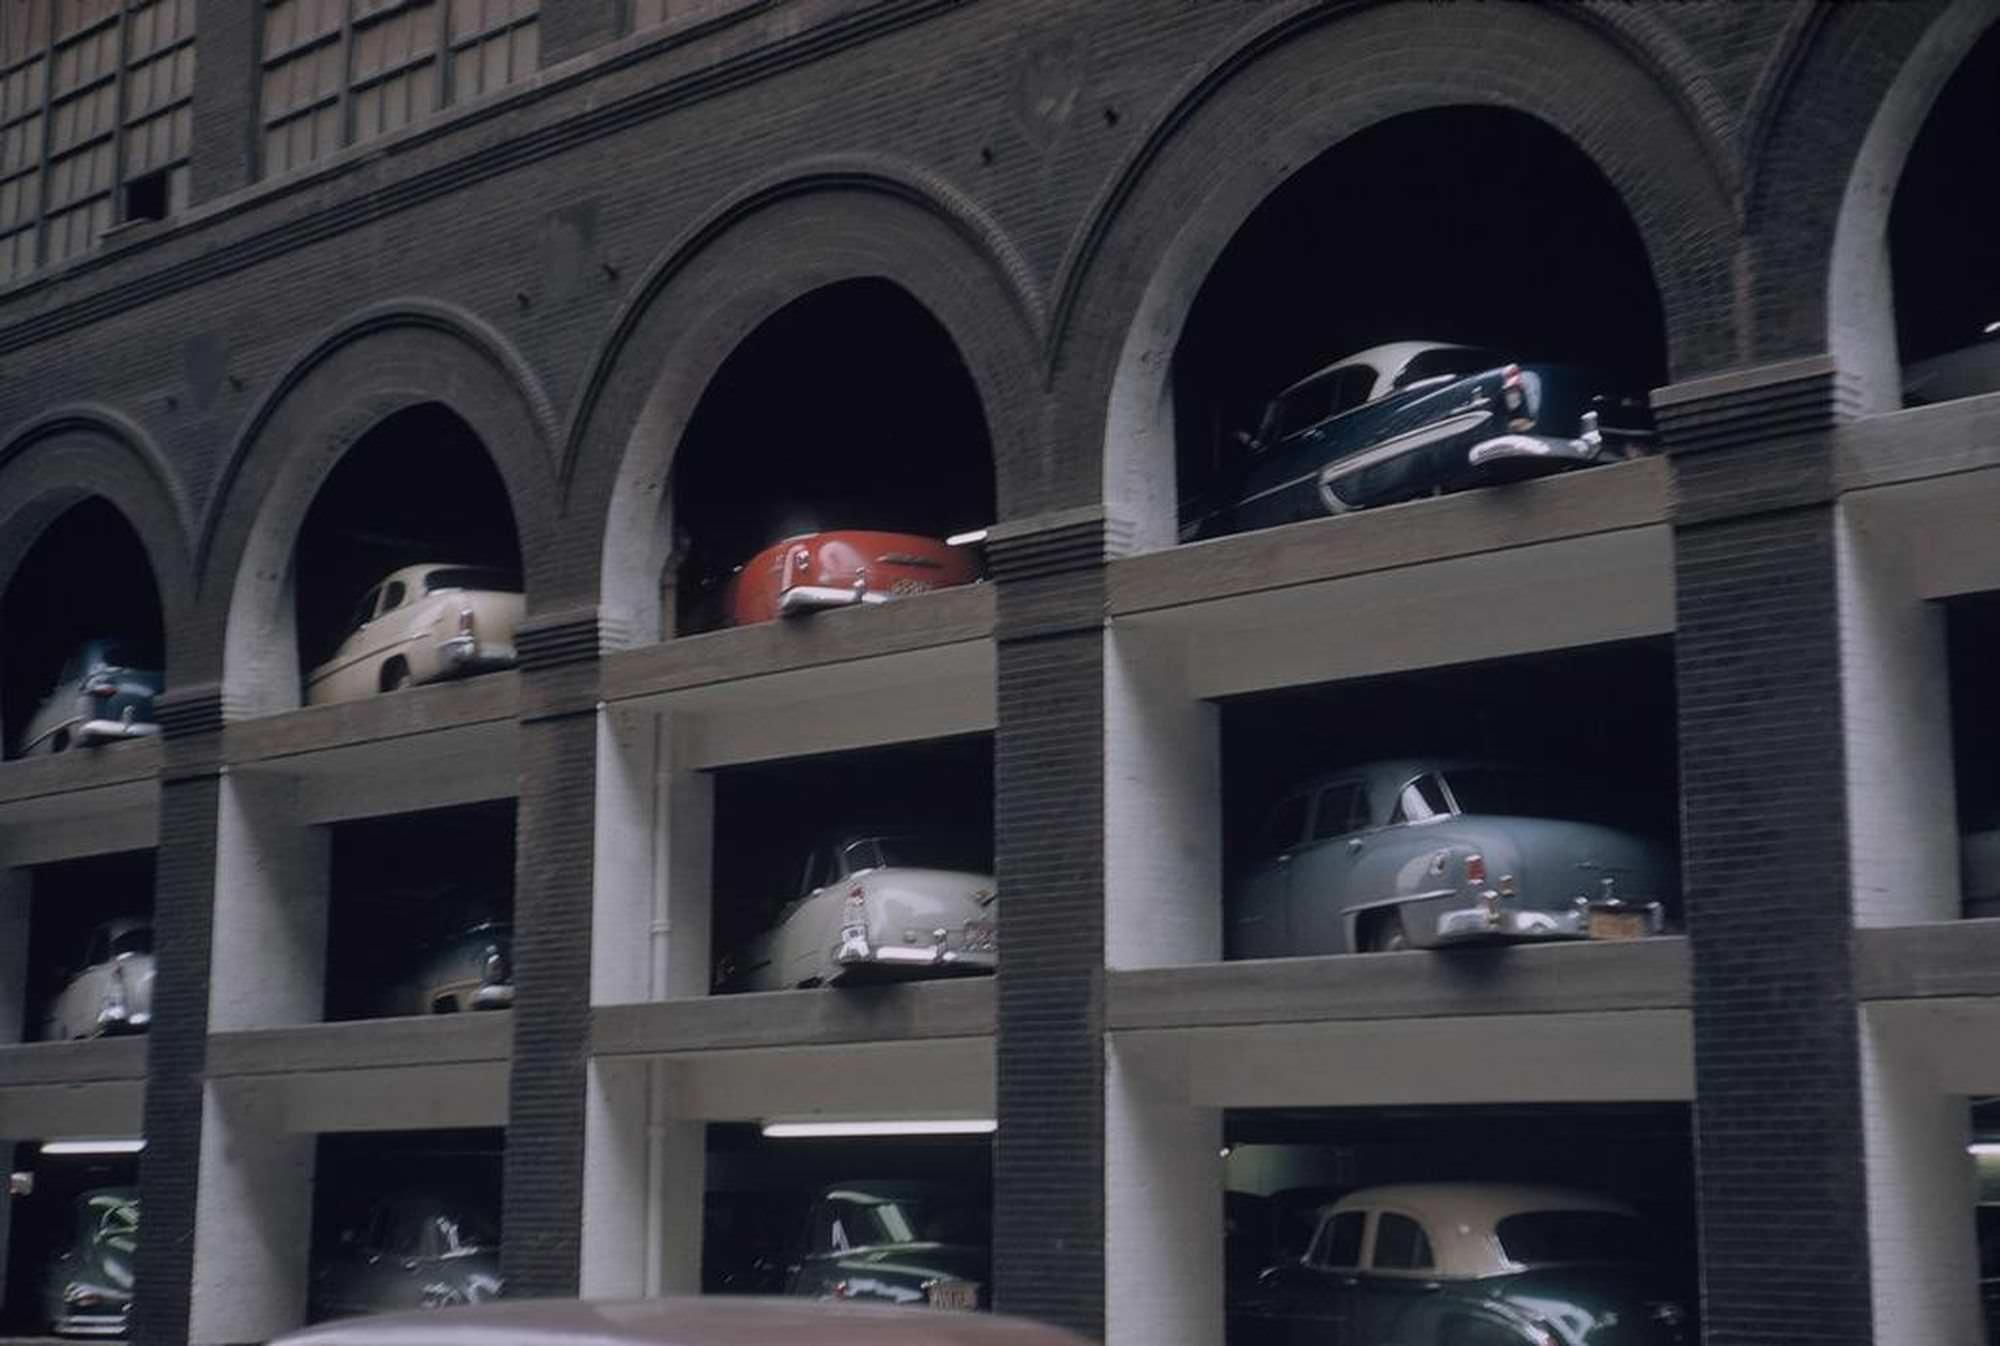 Parking Lot, New York City, USA, 1953.